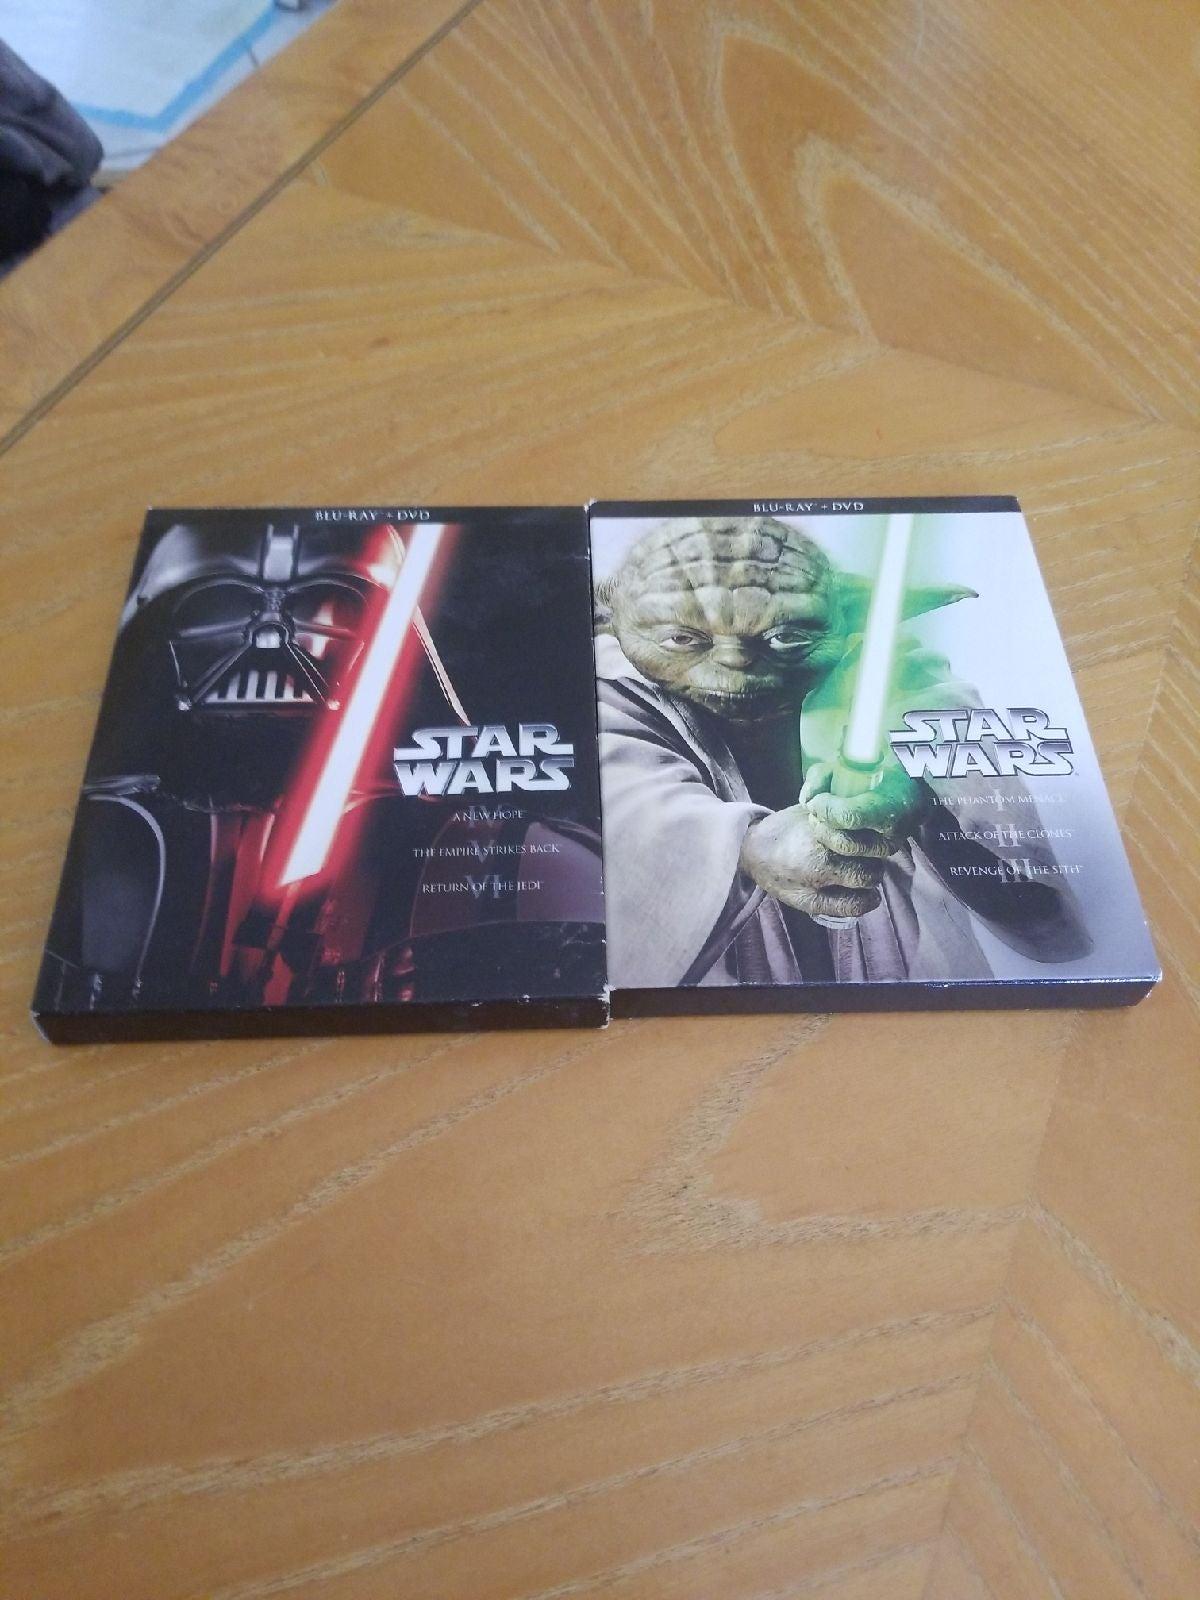 Star wars saga on blu ray & dvd